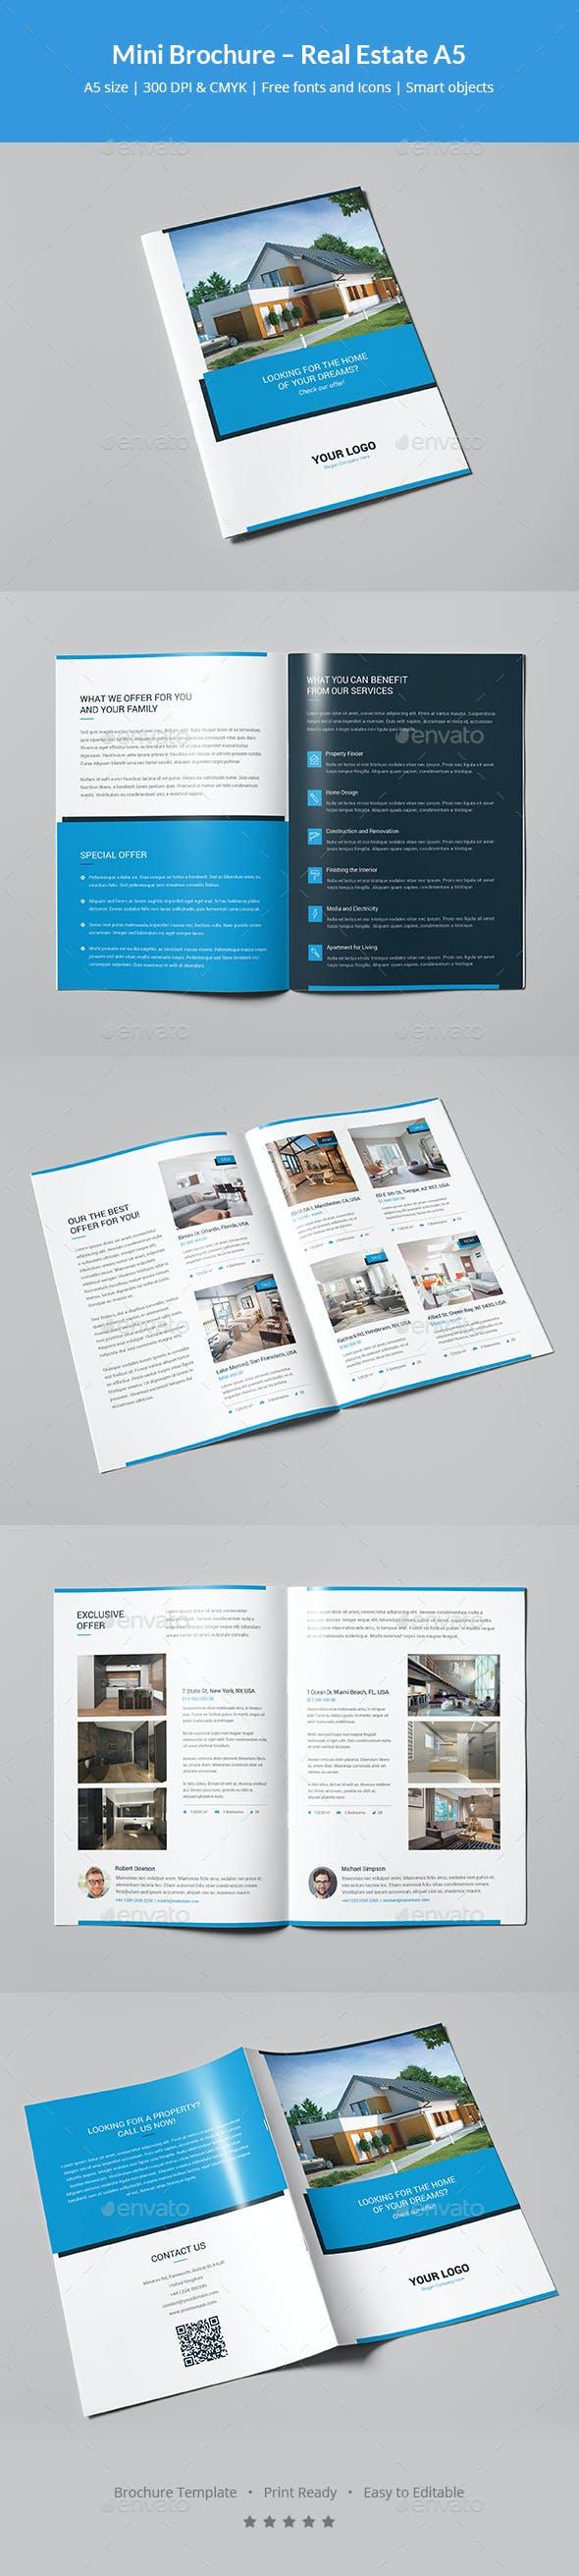 mini brochure real estate a5 by artbart graphicriver